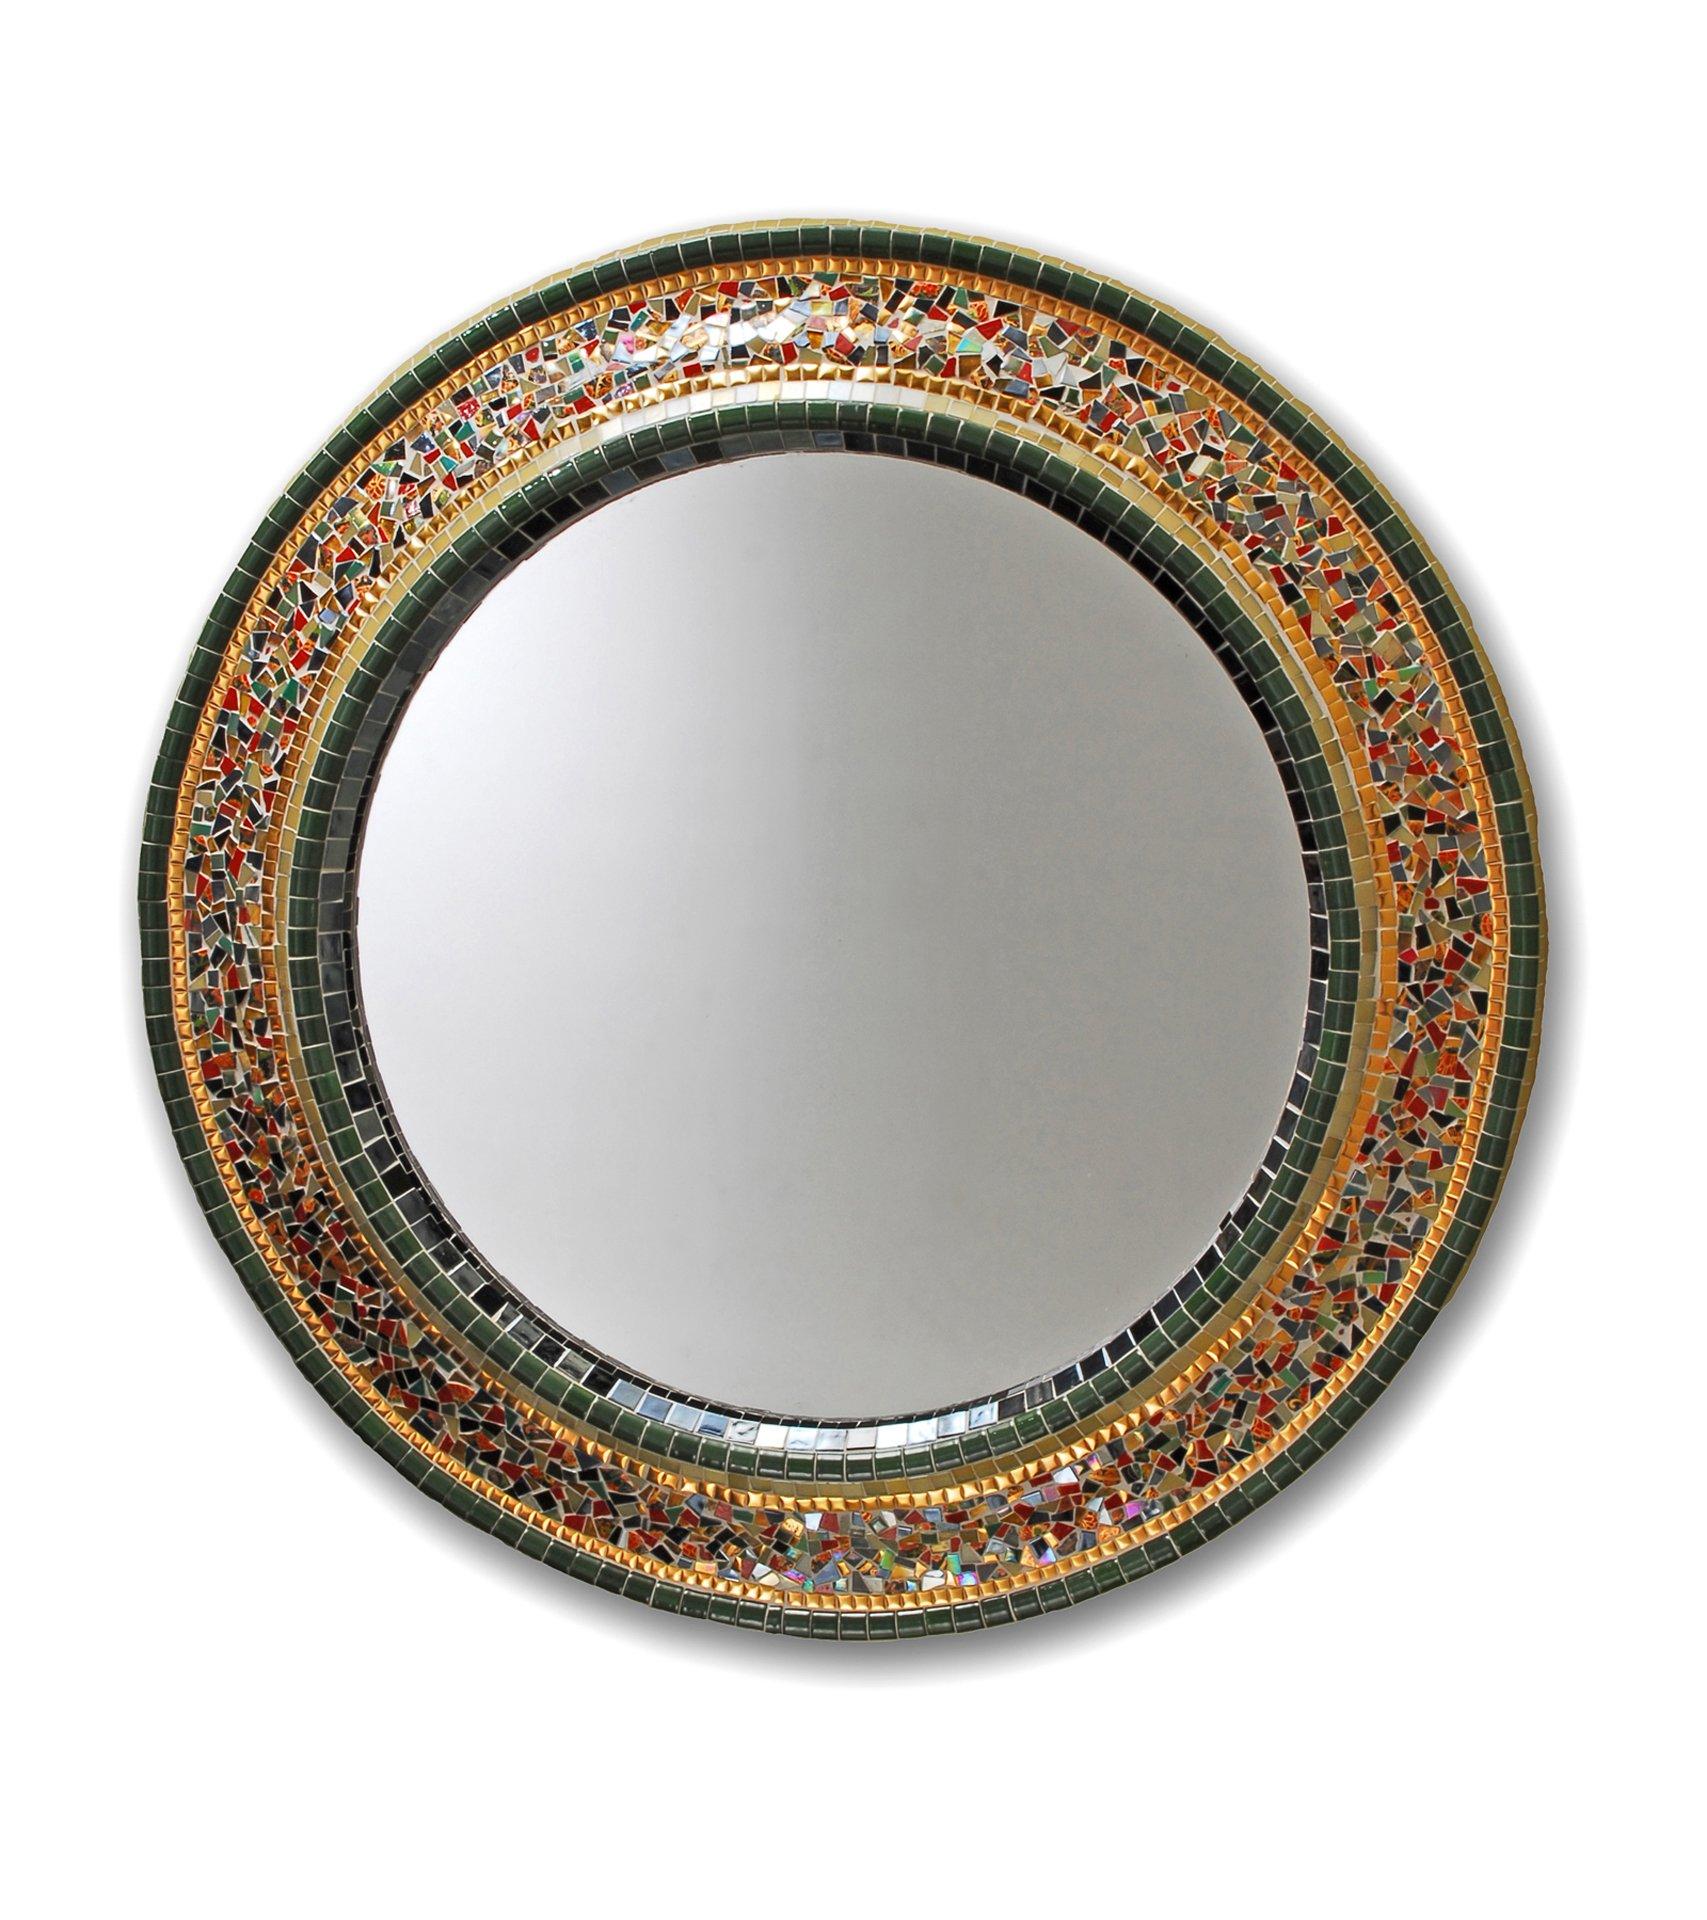 Nancy pollock nancy pollock studio artist profile for Mosaic mirror